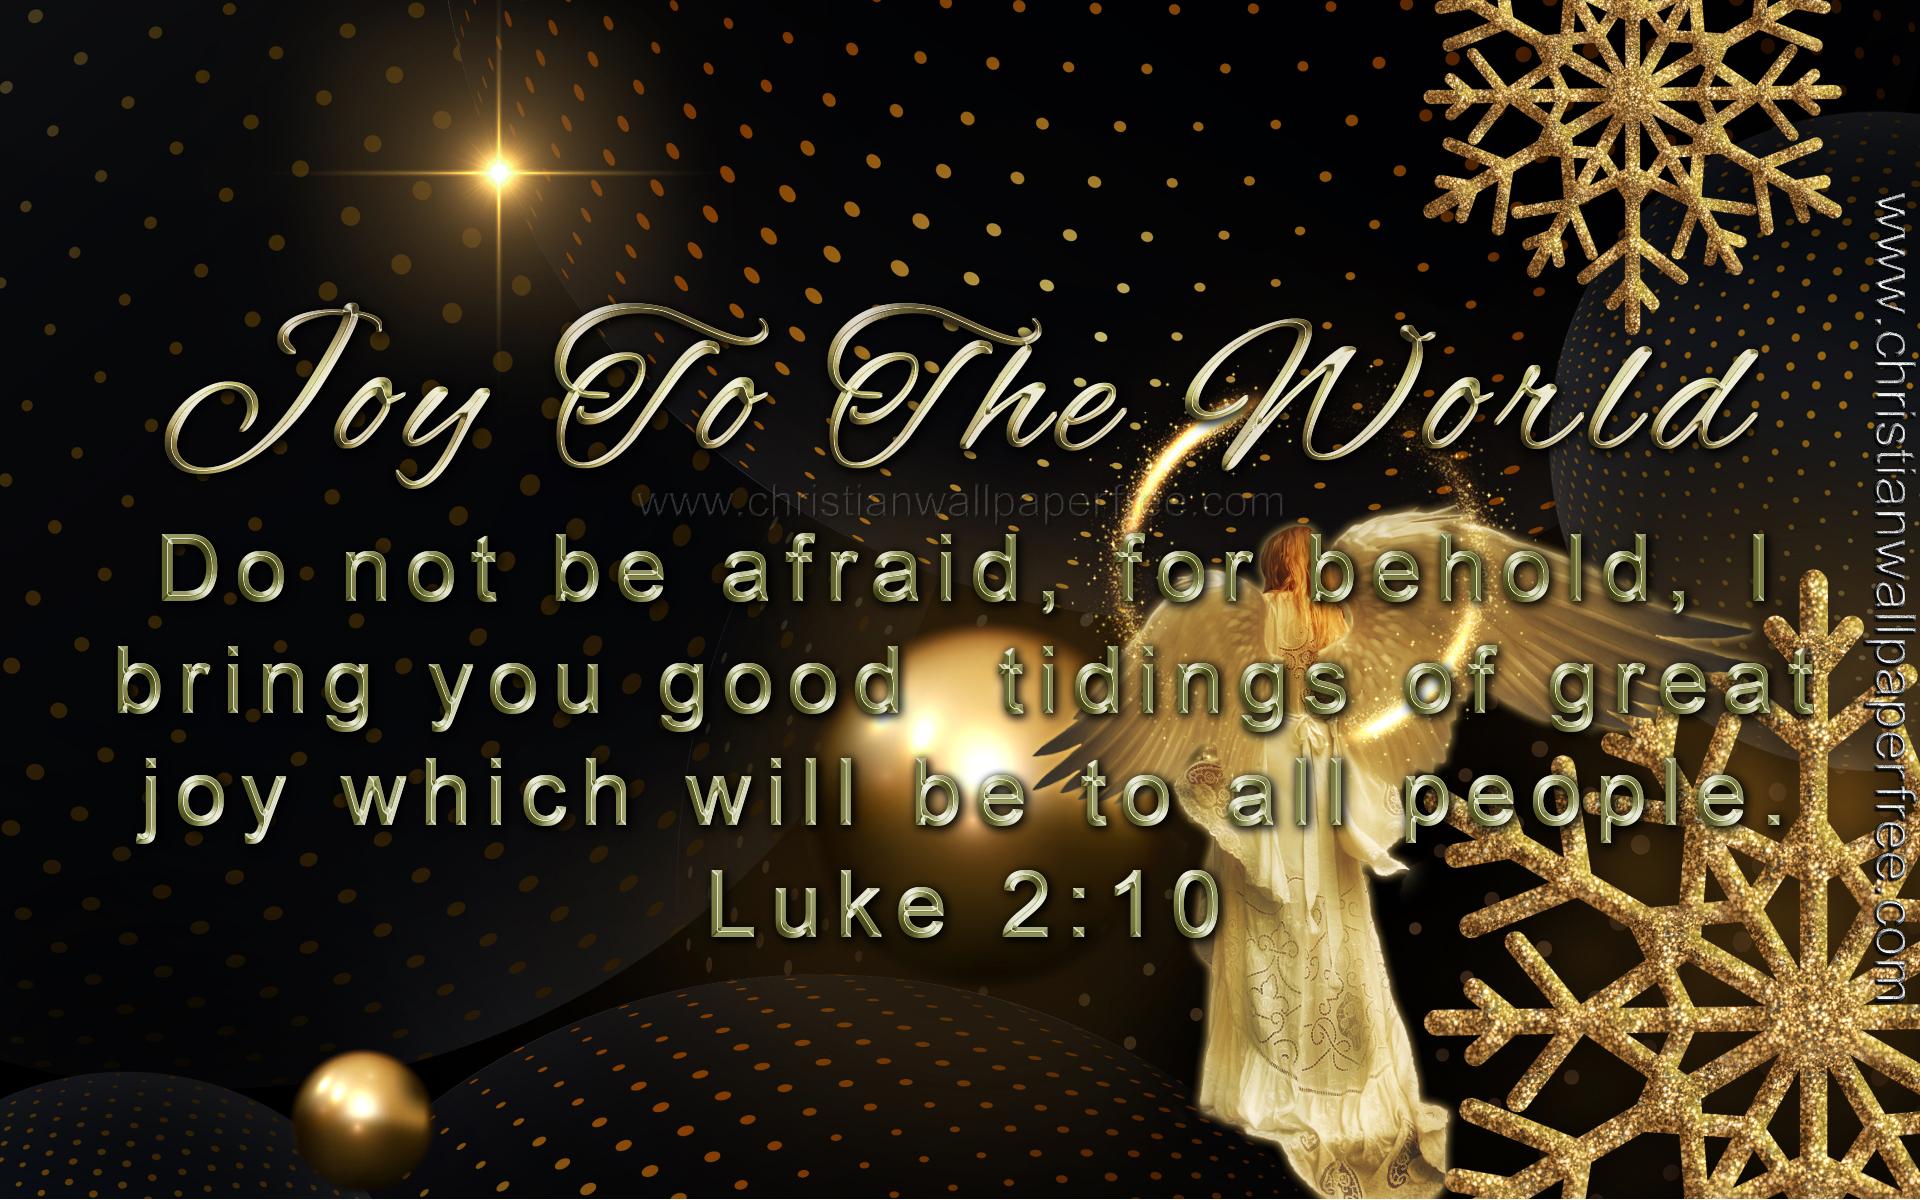 Joy To The World Luke 2 Verse 10 Christian Wallpaper Free